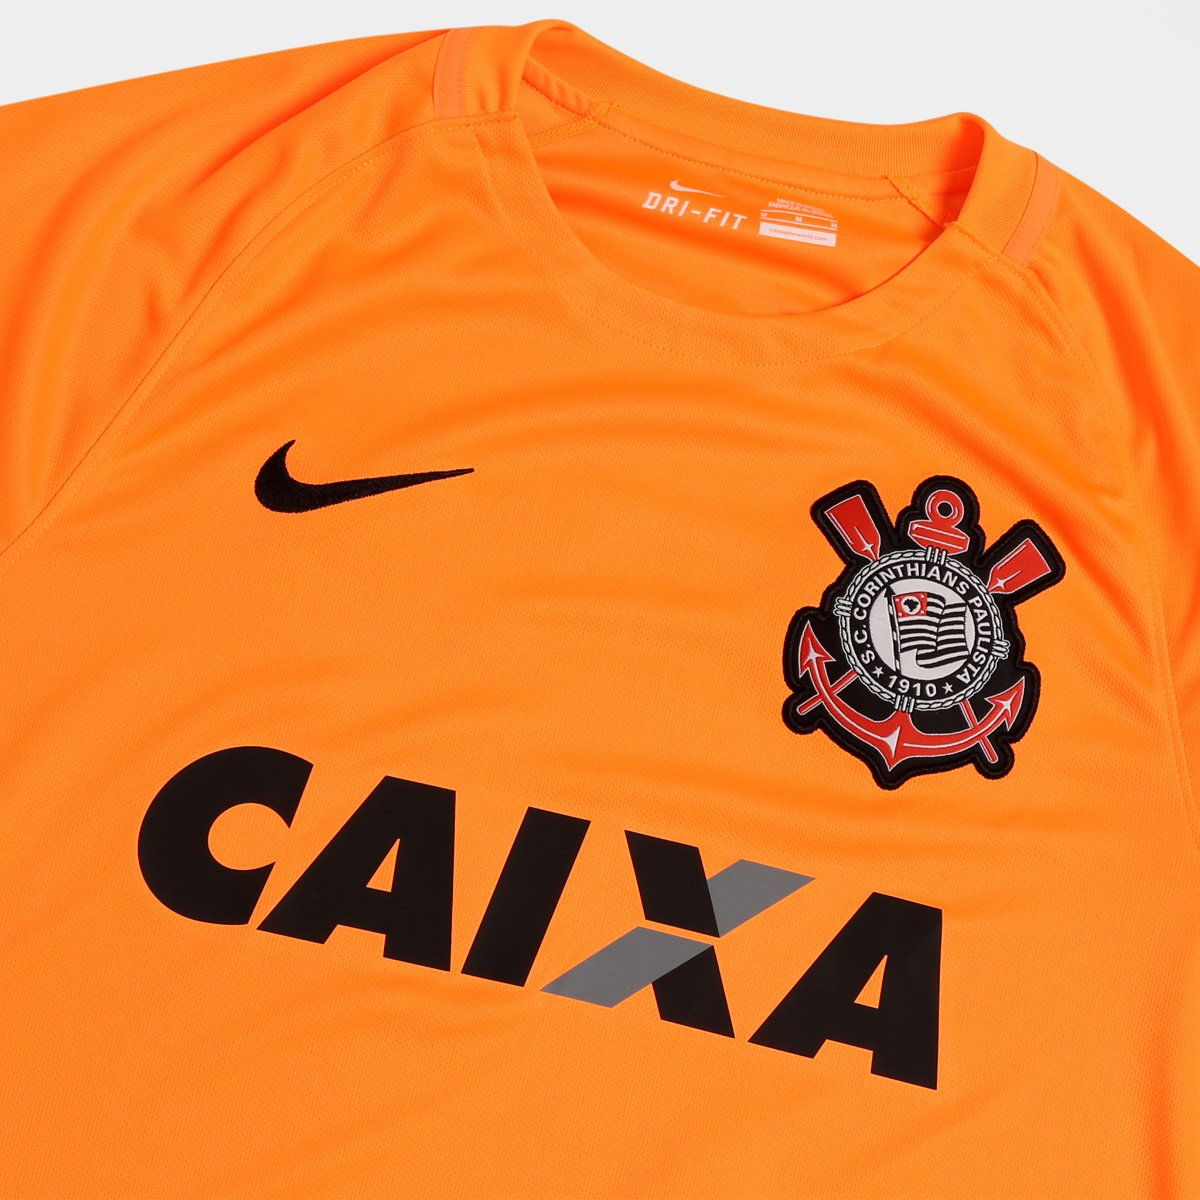 Camisa Corinthians III 15 16 s nº - Torcedor Nike Masculina - Compre ... 2a3a8e23ba160